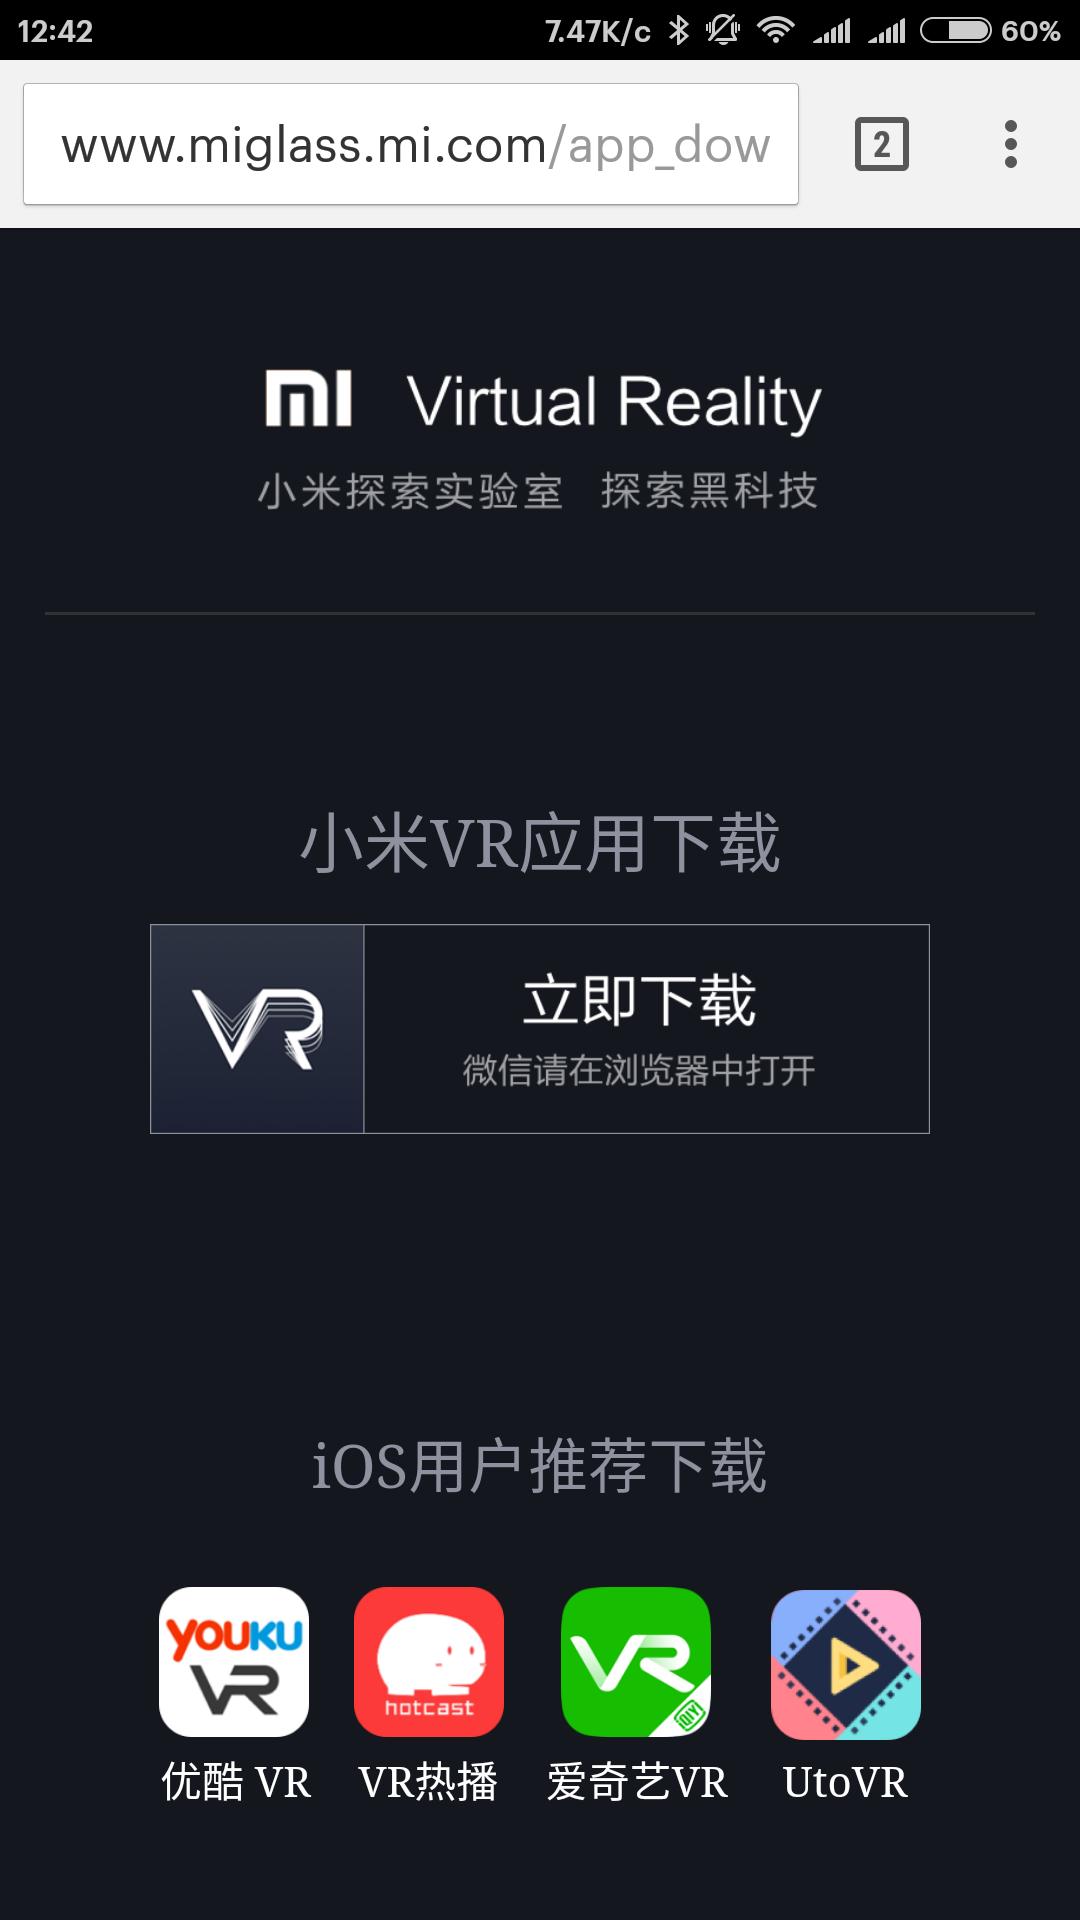 Banggood: Бюджетная виртуальная реальность - Xiaomi 3D VR Virtual Reality Headset Glasses